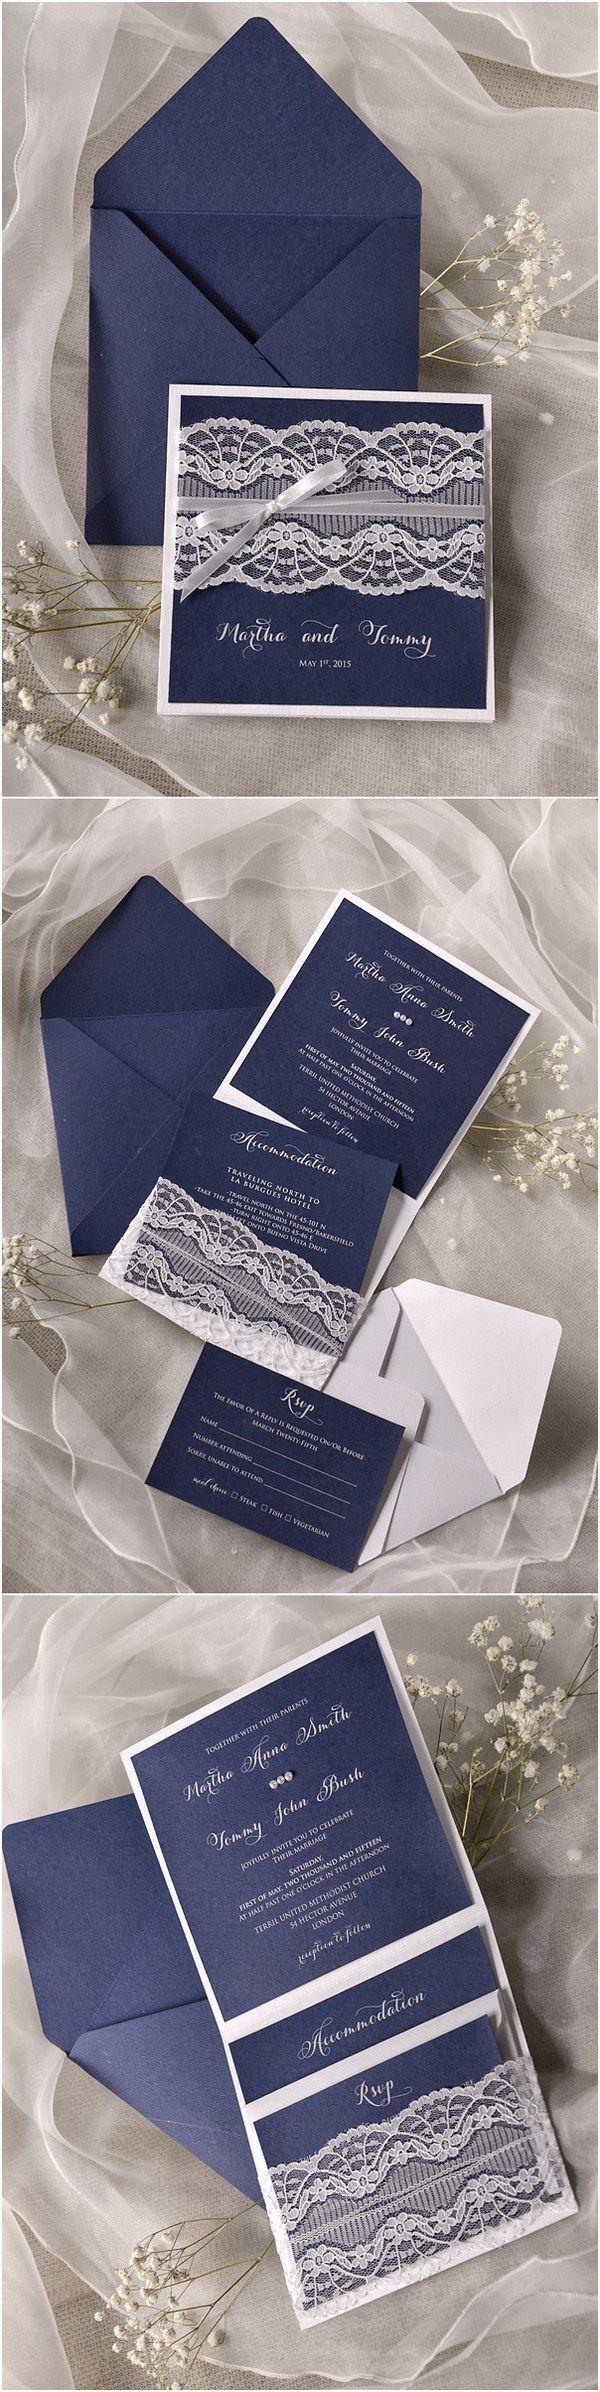 14659 best Wedding Invitation images on Pinterest | Wedding ...